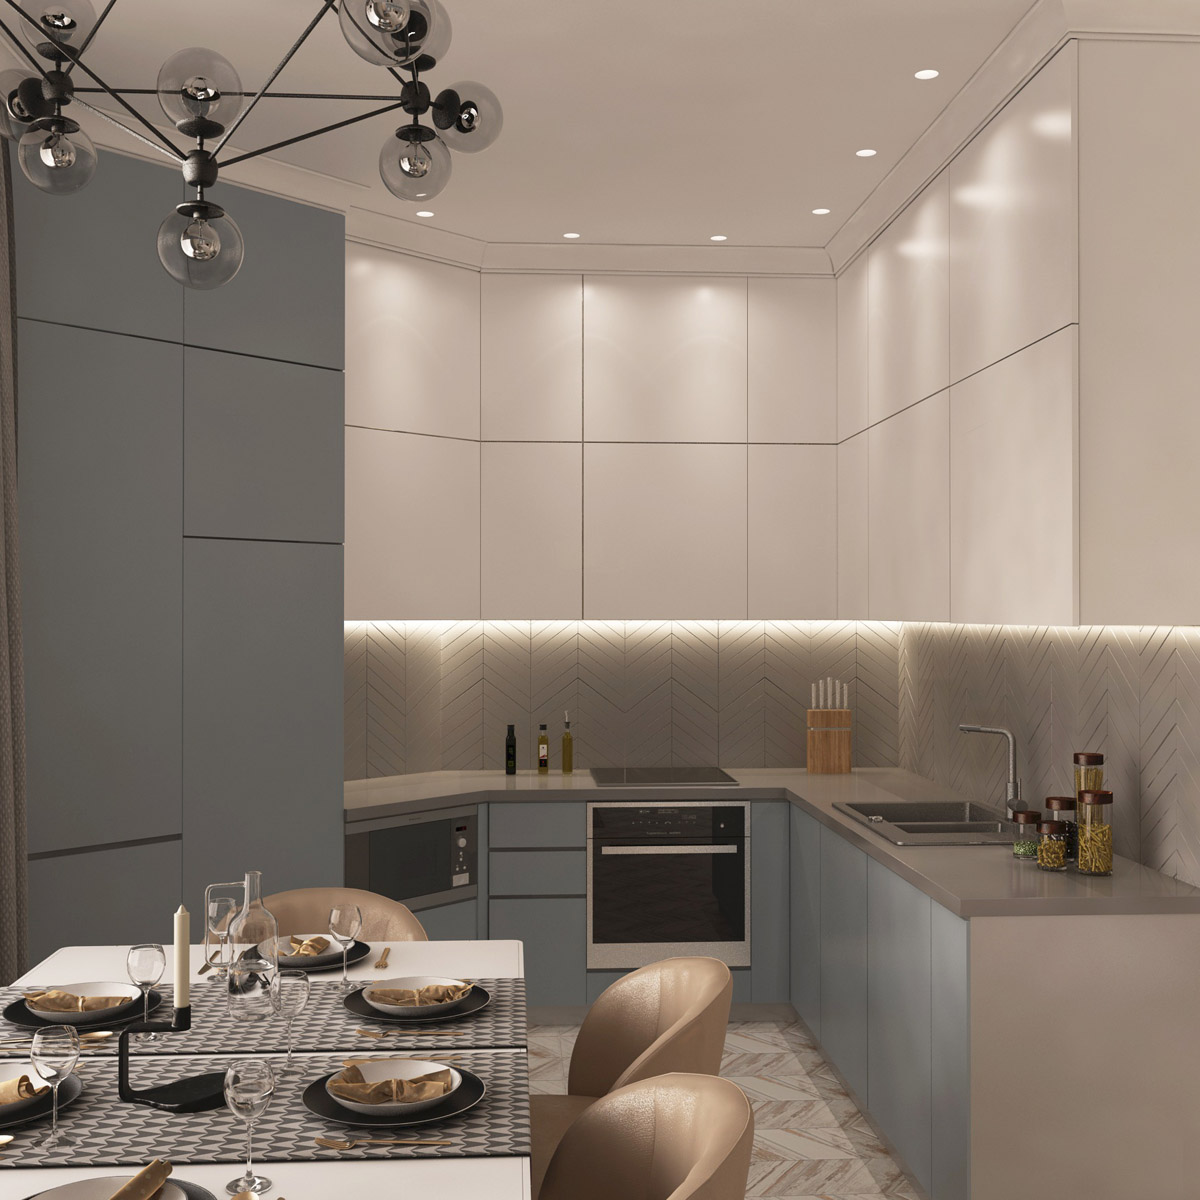 Дизайн кухні | проект Оболонський проспект